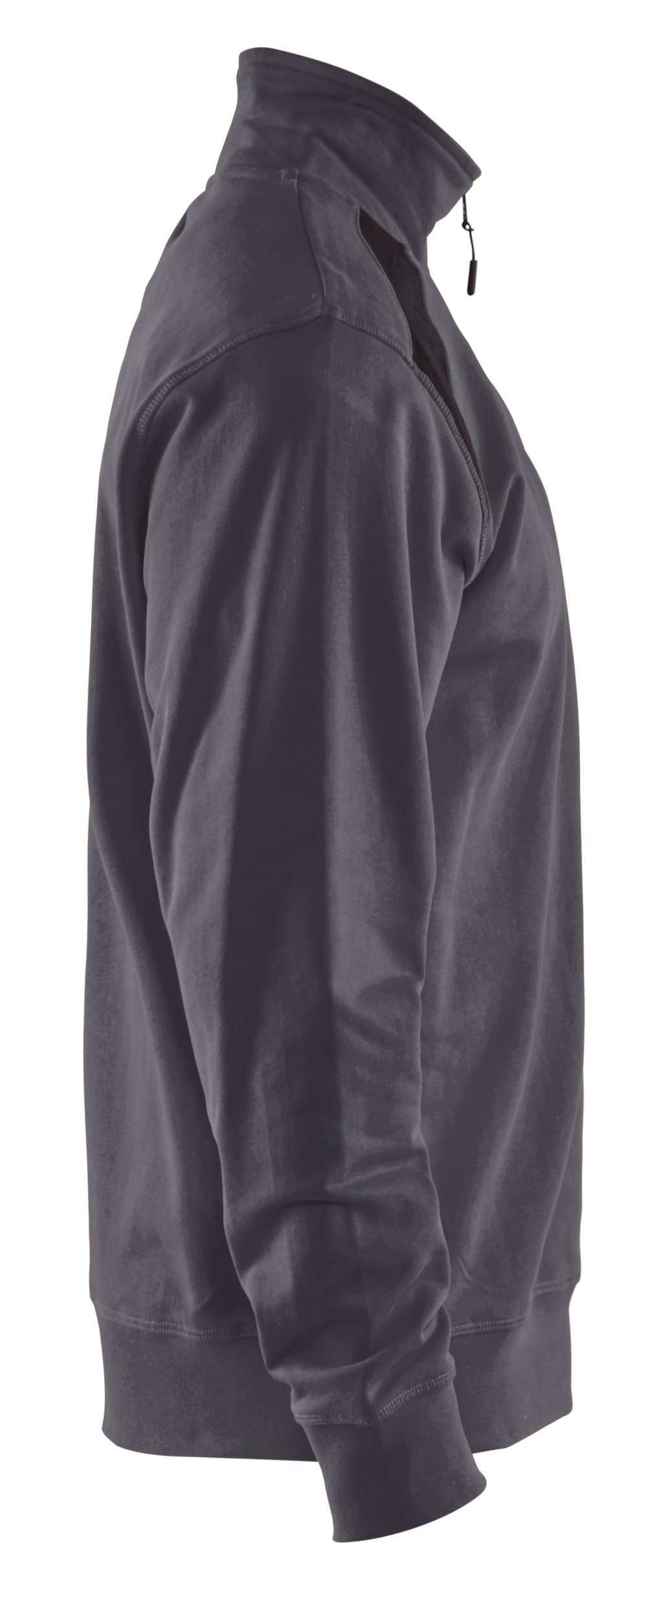 Blaklader Truien 33531158 midden grijs-zwart(9699)